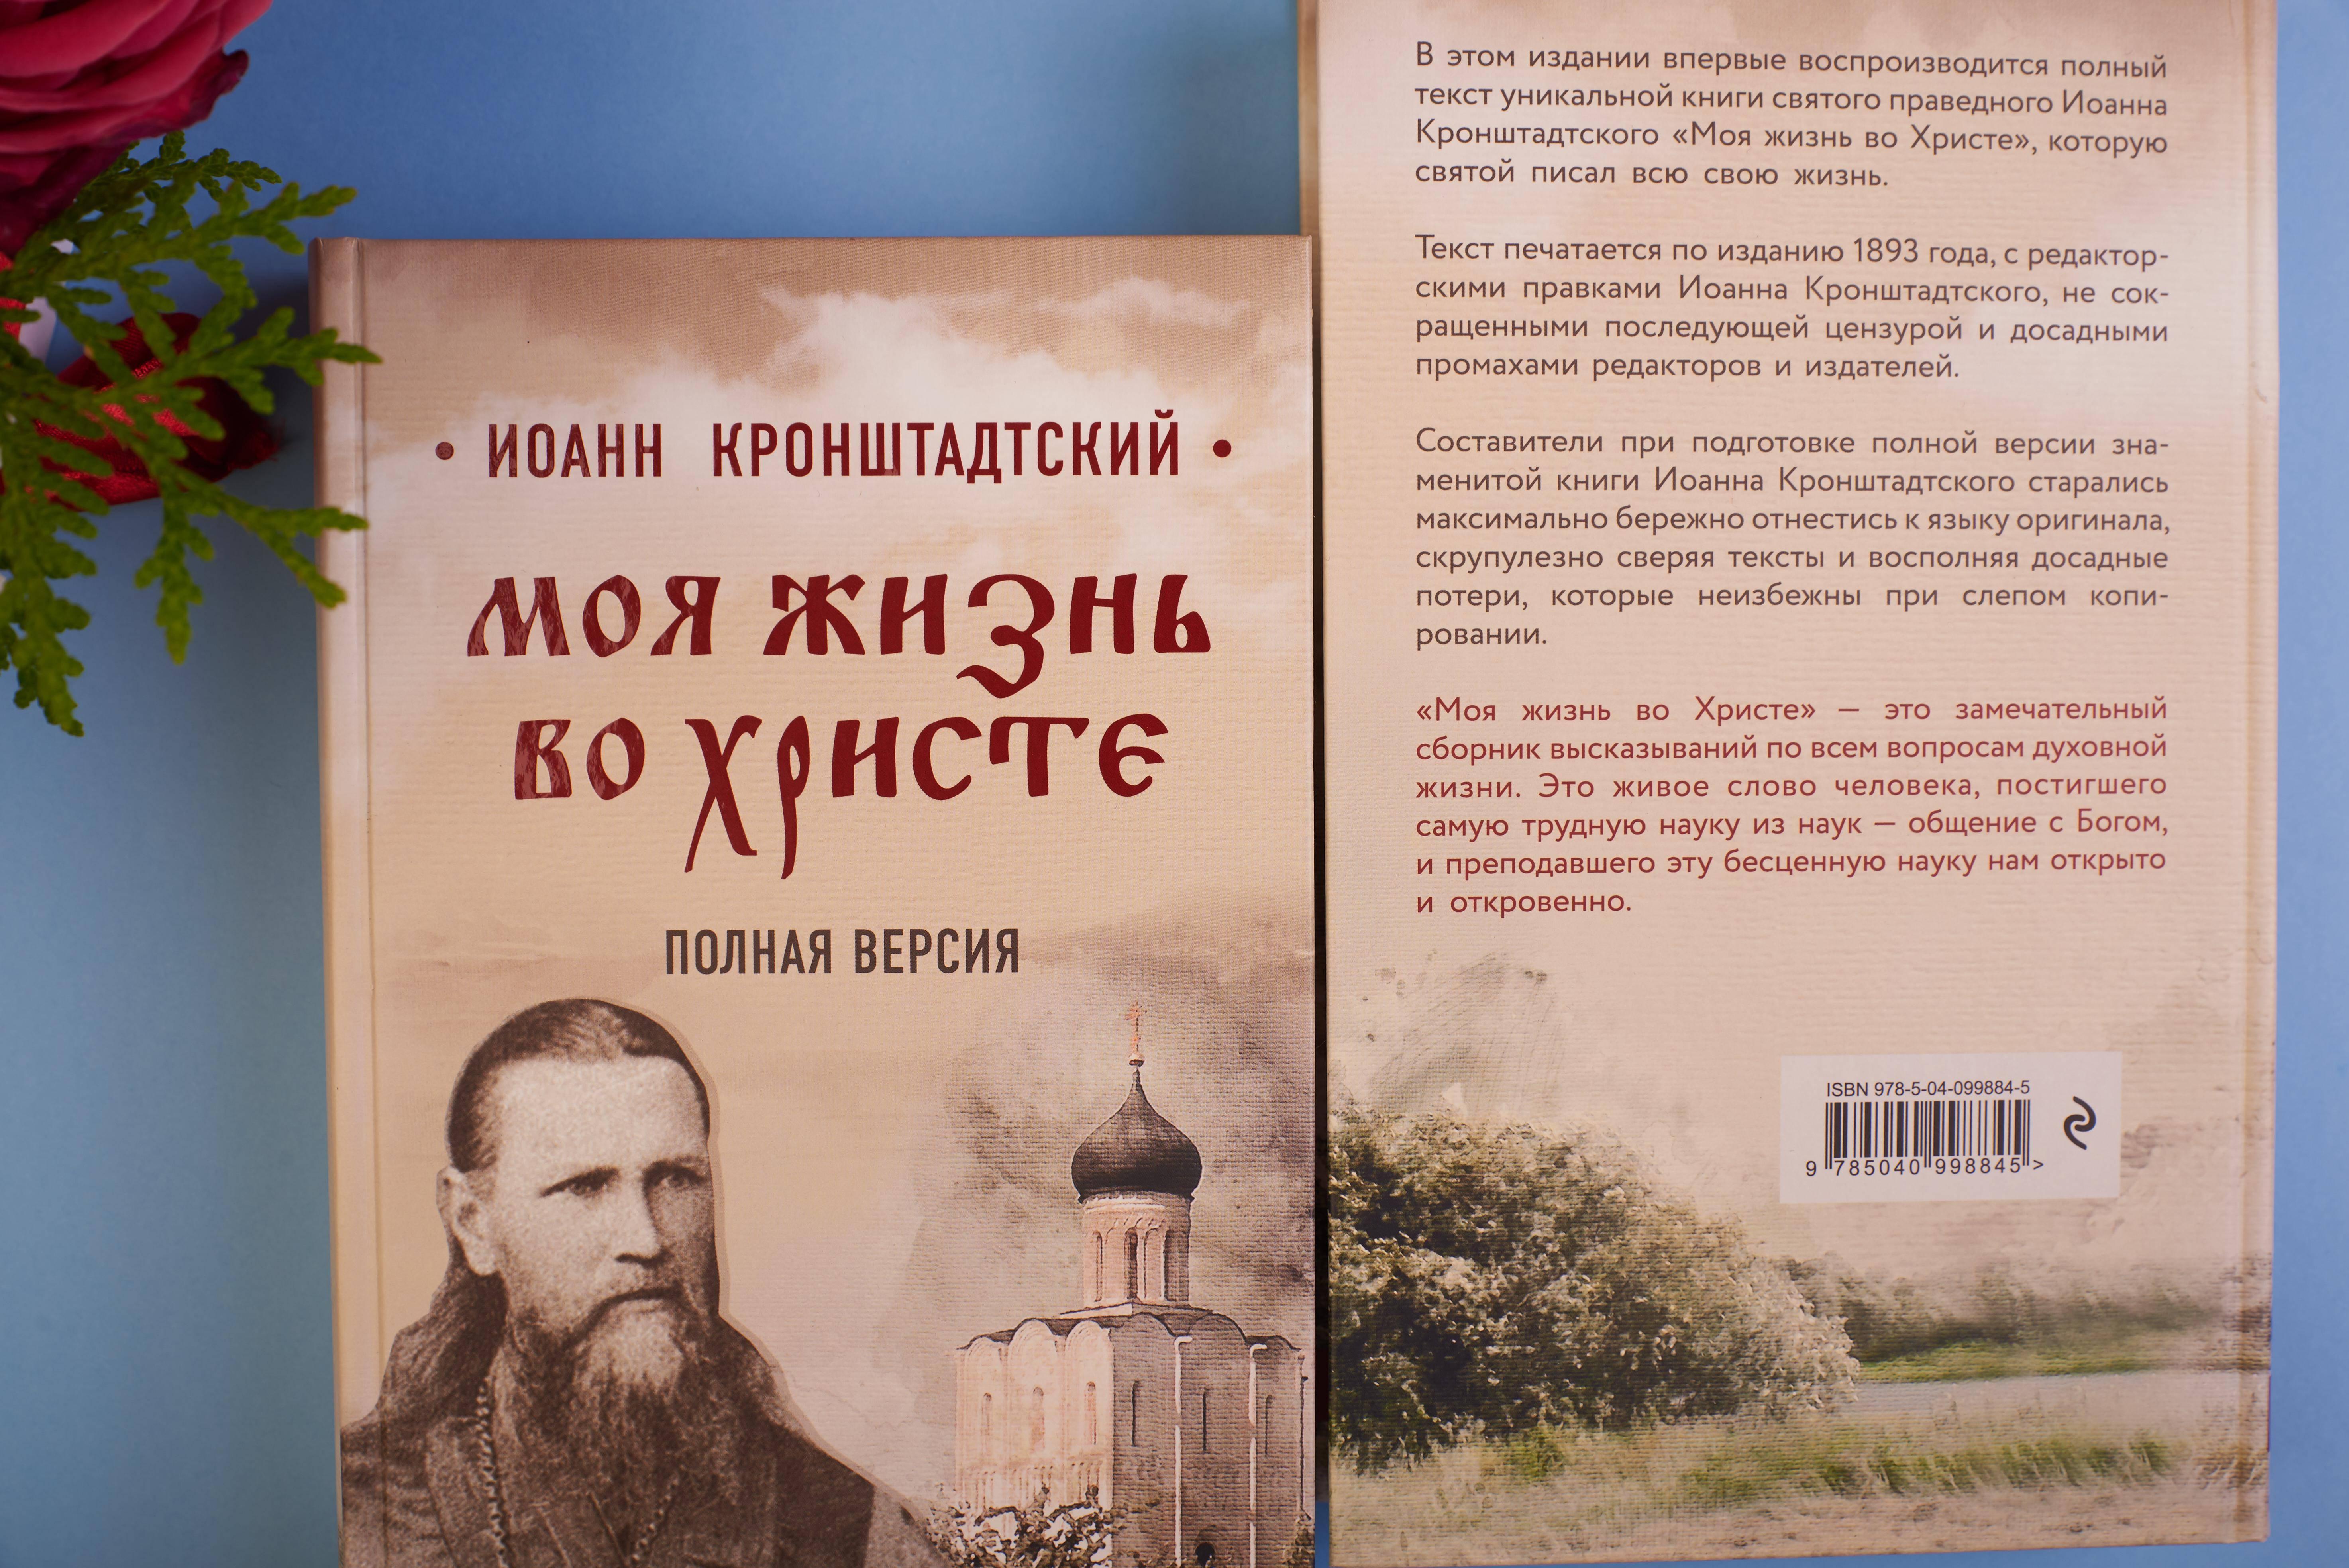 О чудесах отца иоанна кронштадтского. чудеса божии